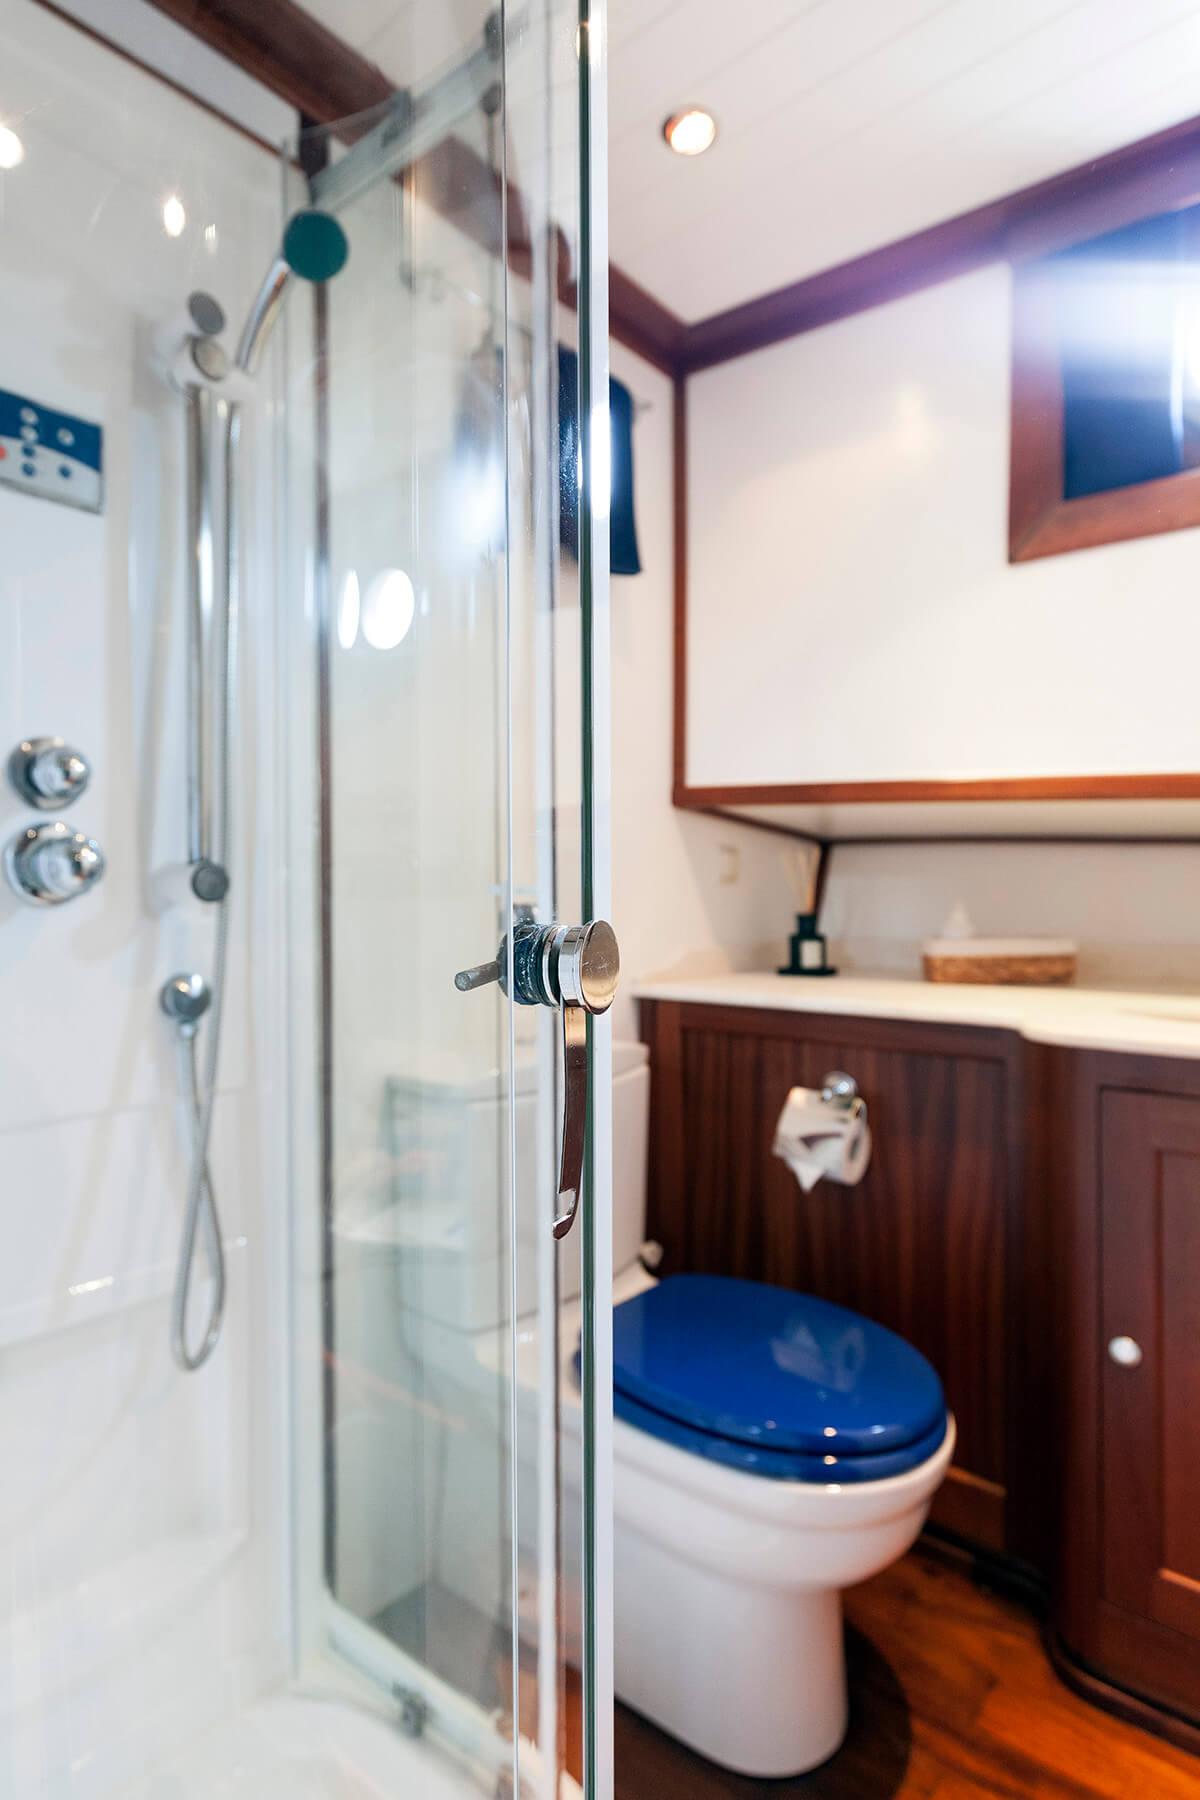 LUOPAN Blue Cabin Bathroom - Gulet Expert